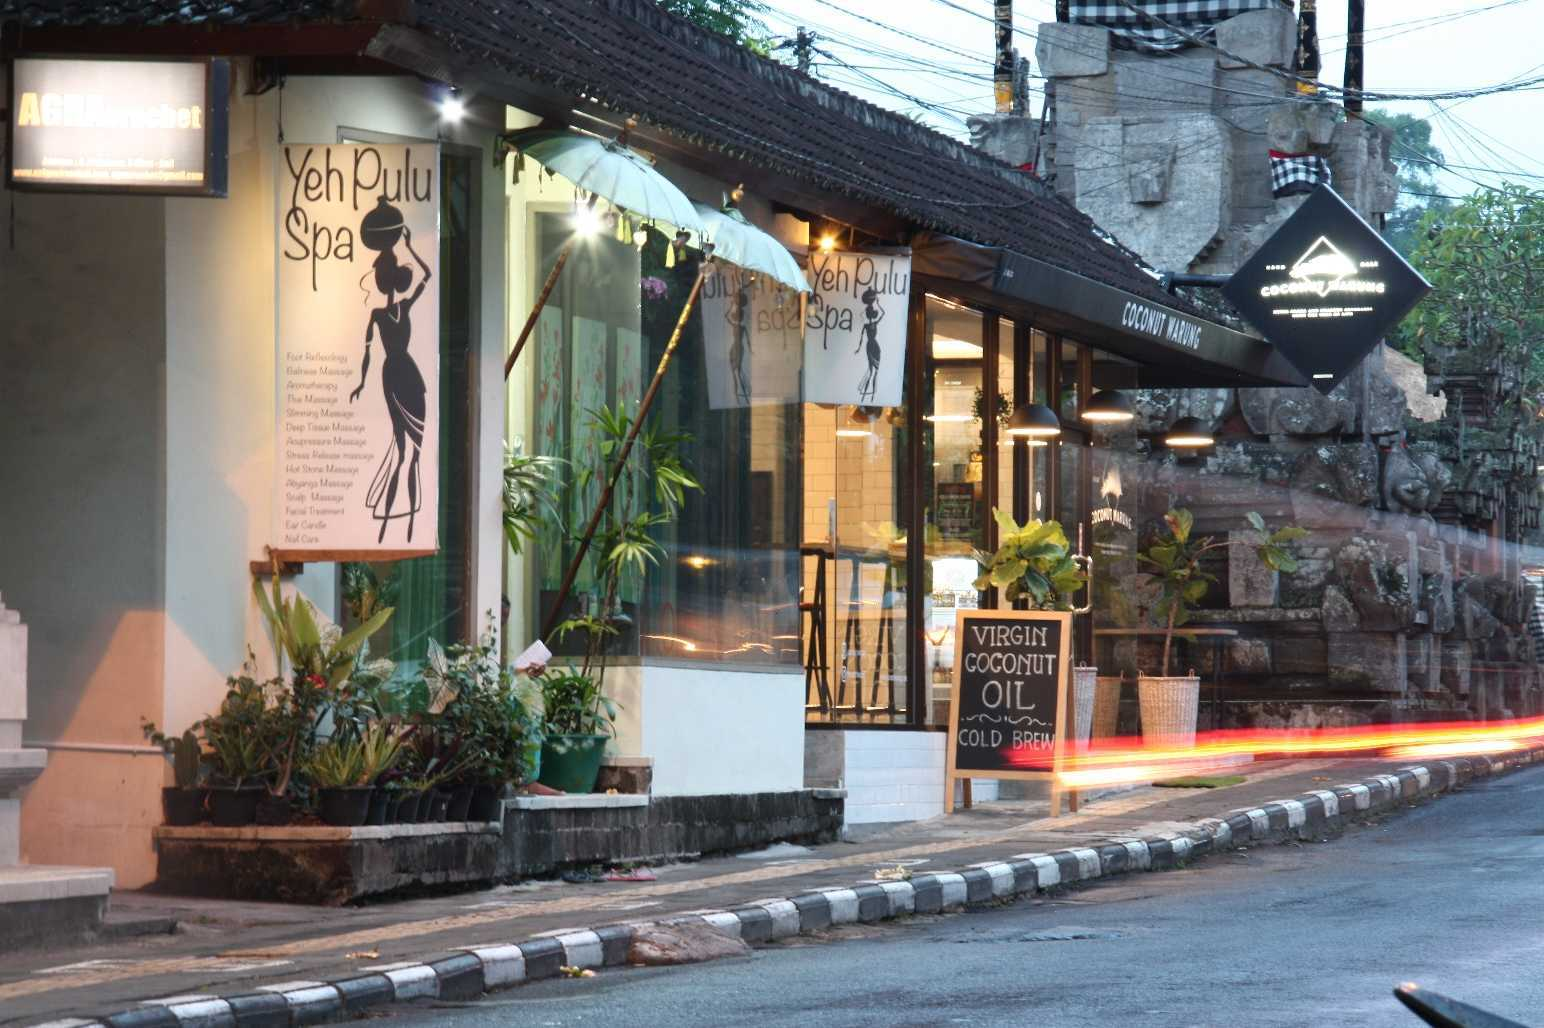 Ddap Architect Coconut Warung Shop & Cafe Ubud, Kabupaten Gianyar, Bali, Indonesia Bali Img0810 Industrial  28551